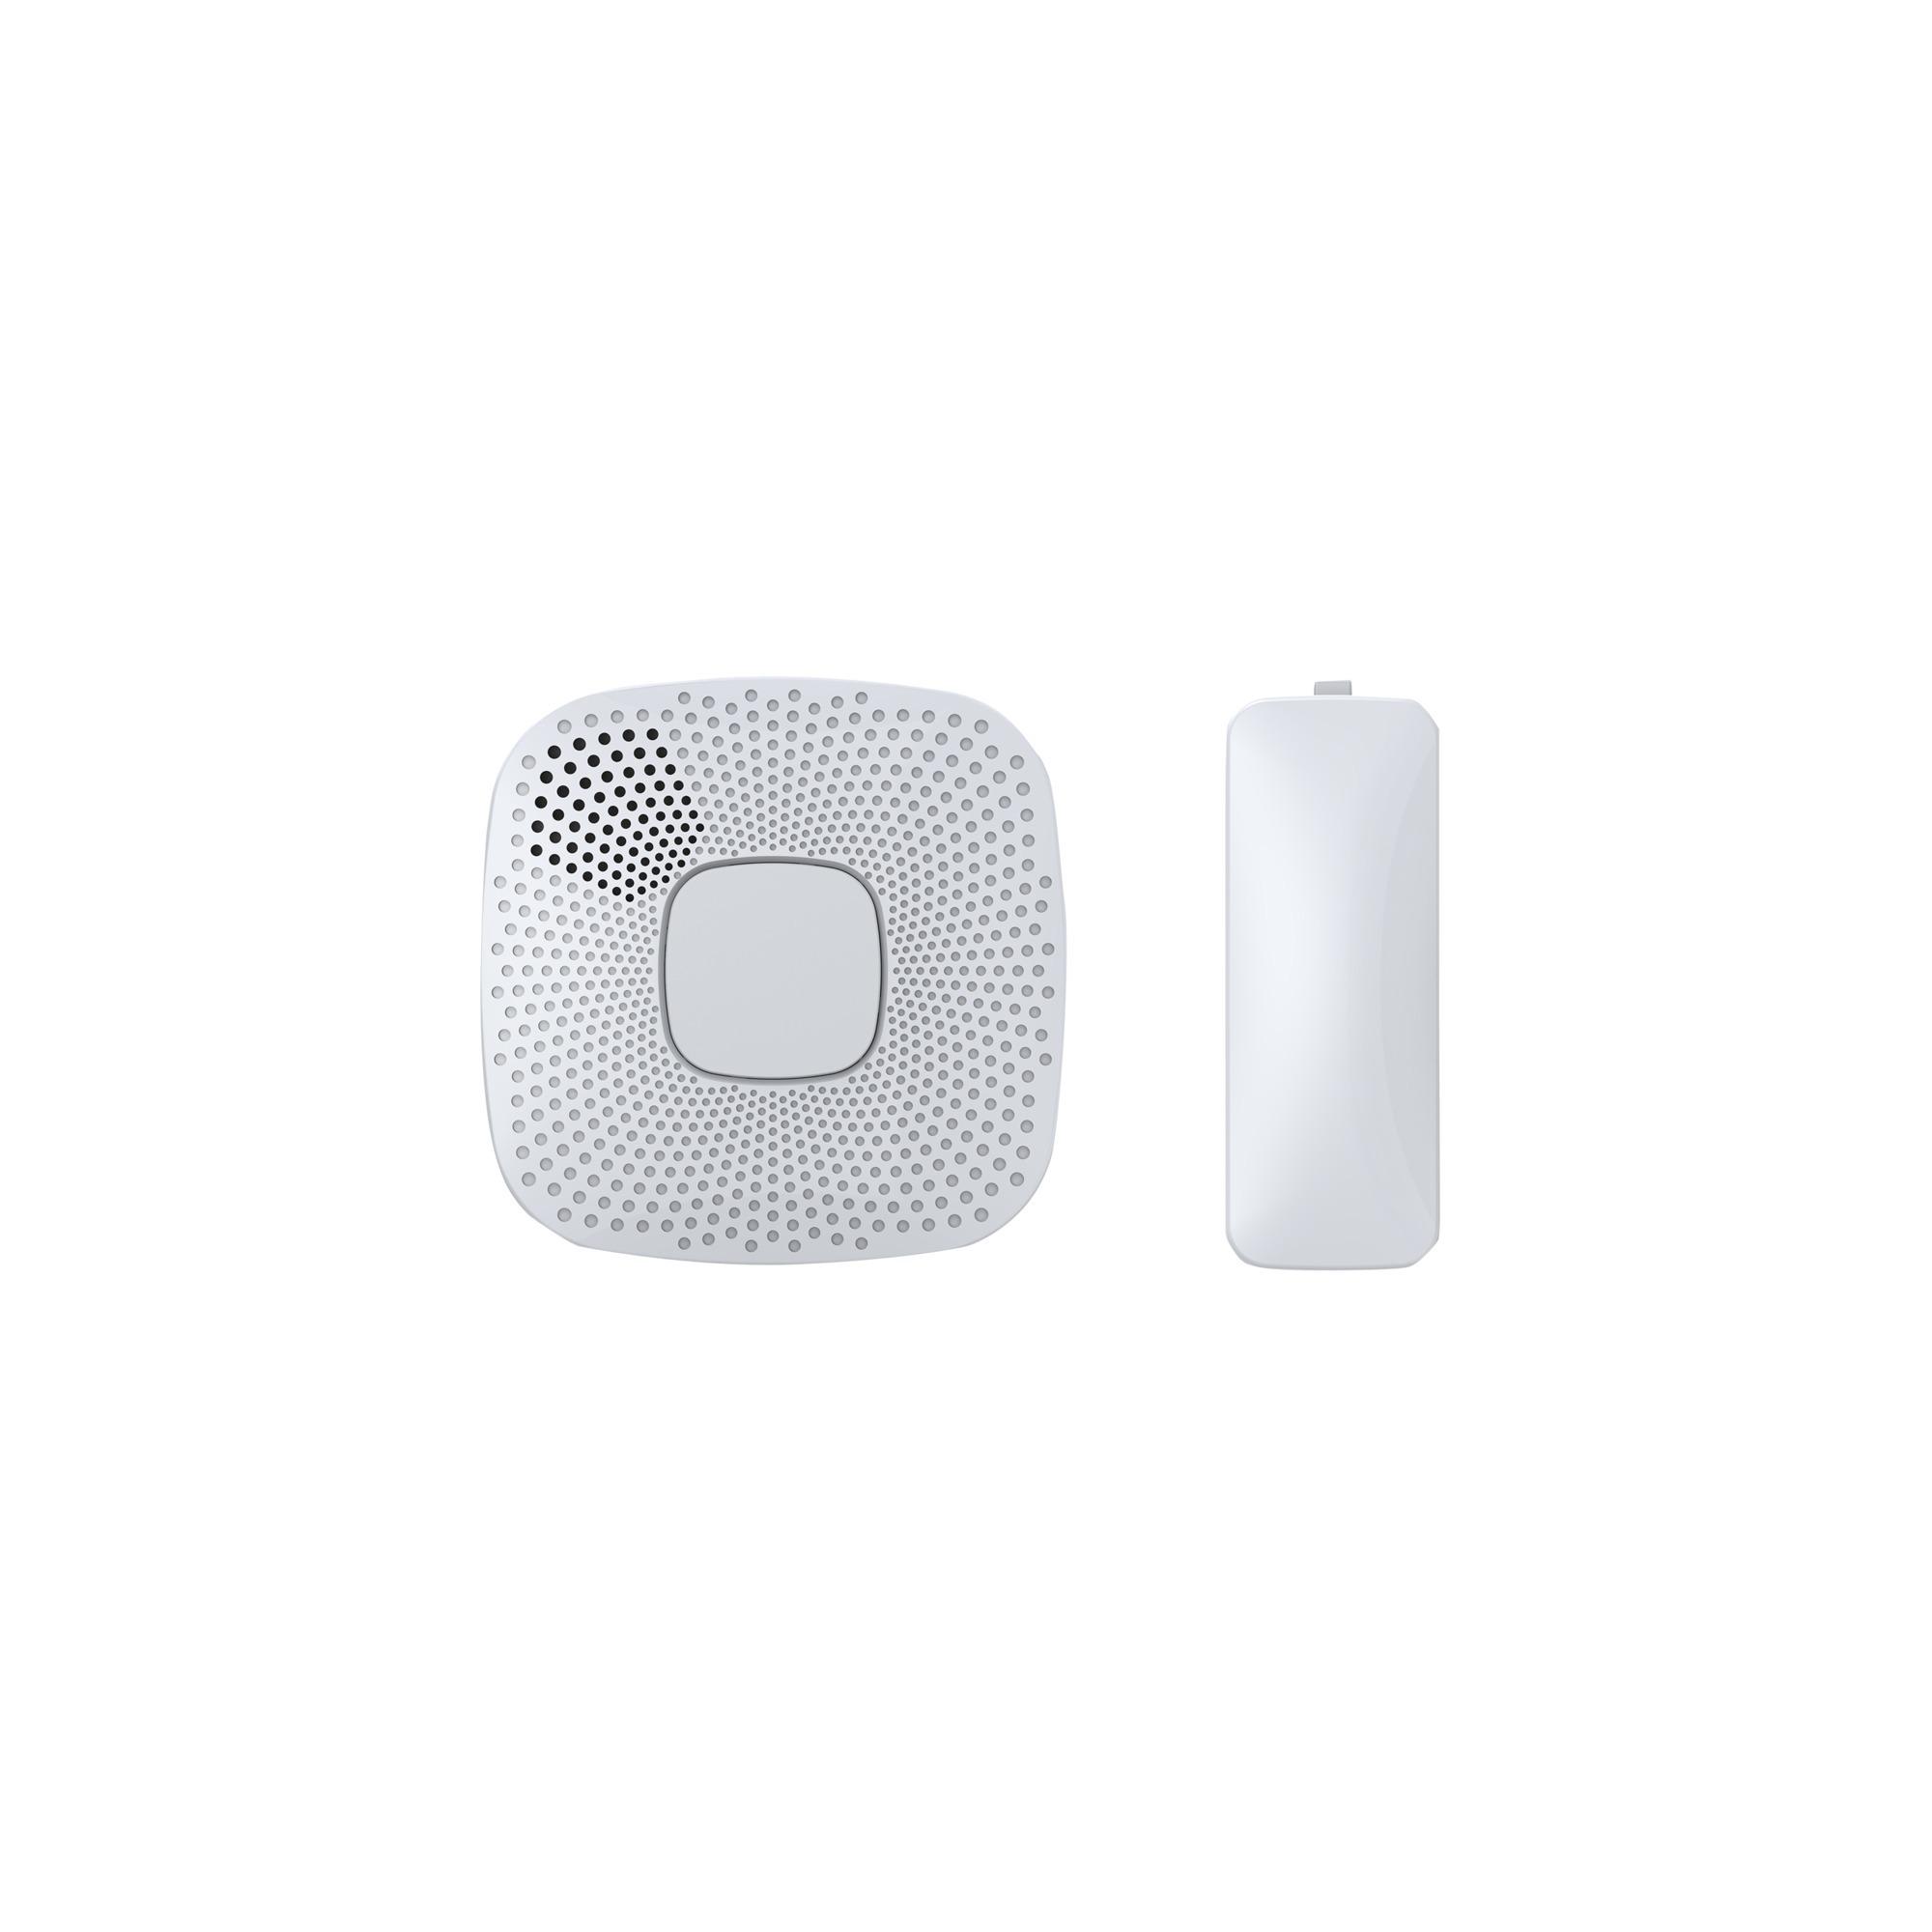 AEOEZW062 Inalámbrico Blanco sensor de puerta / ventana, Controlador de puerta de garaje